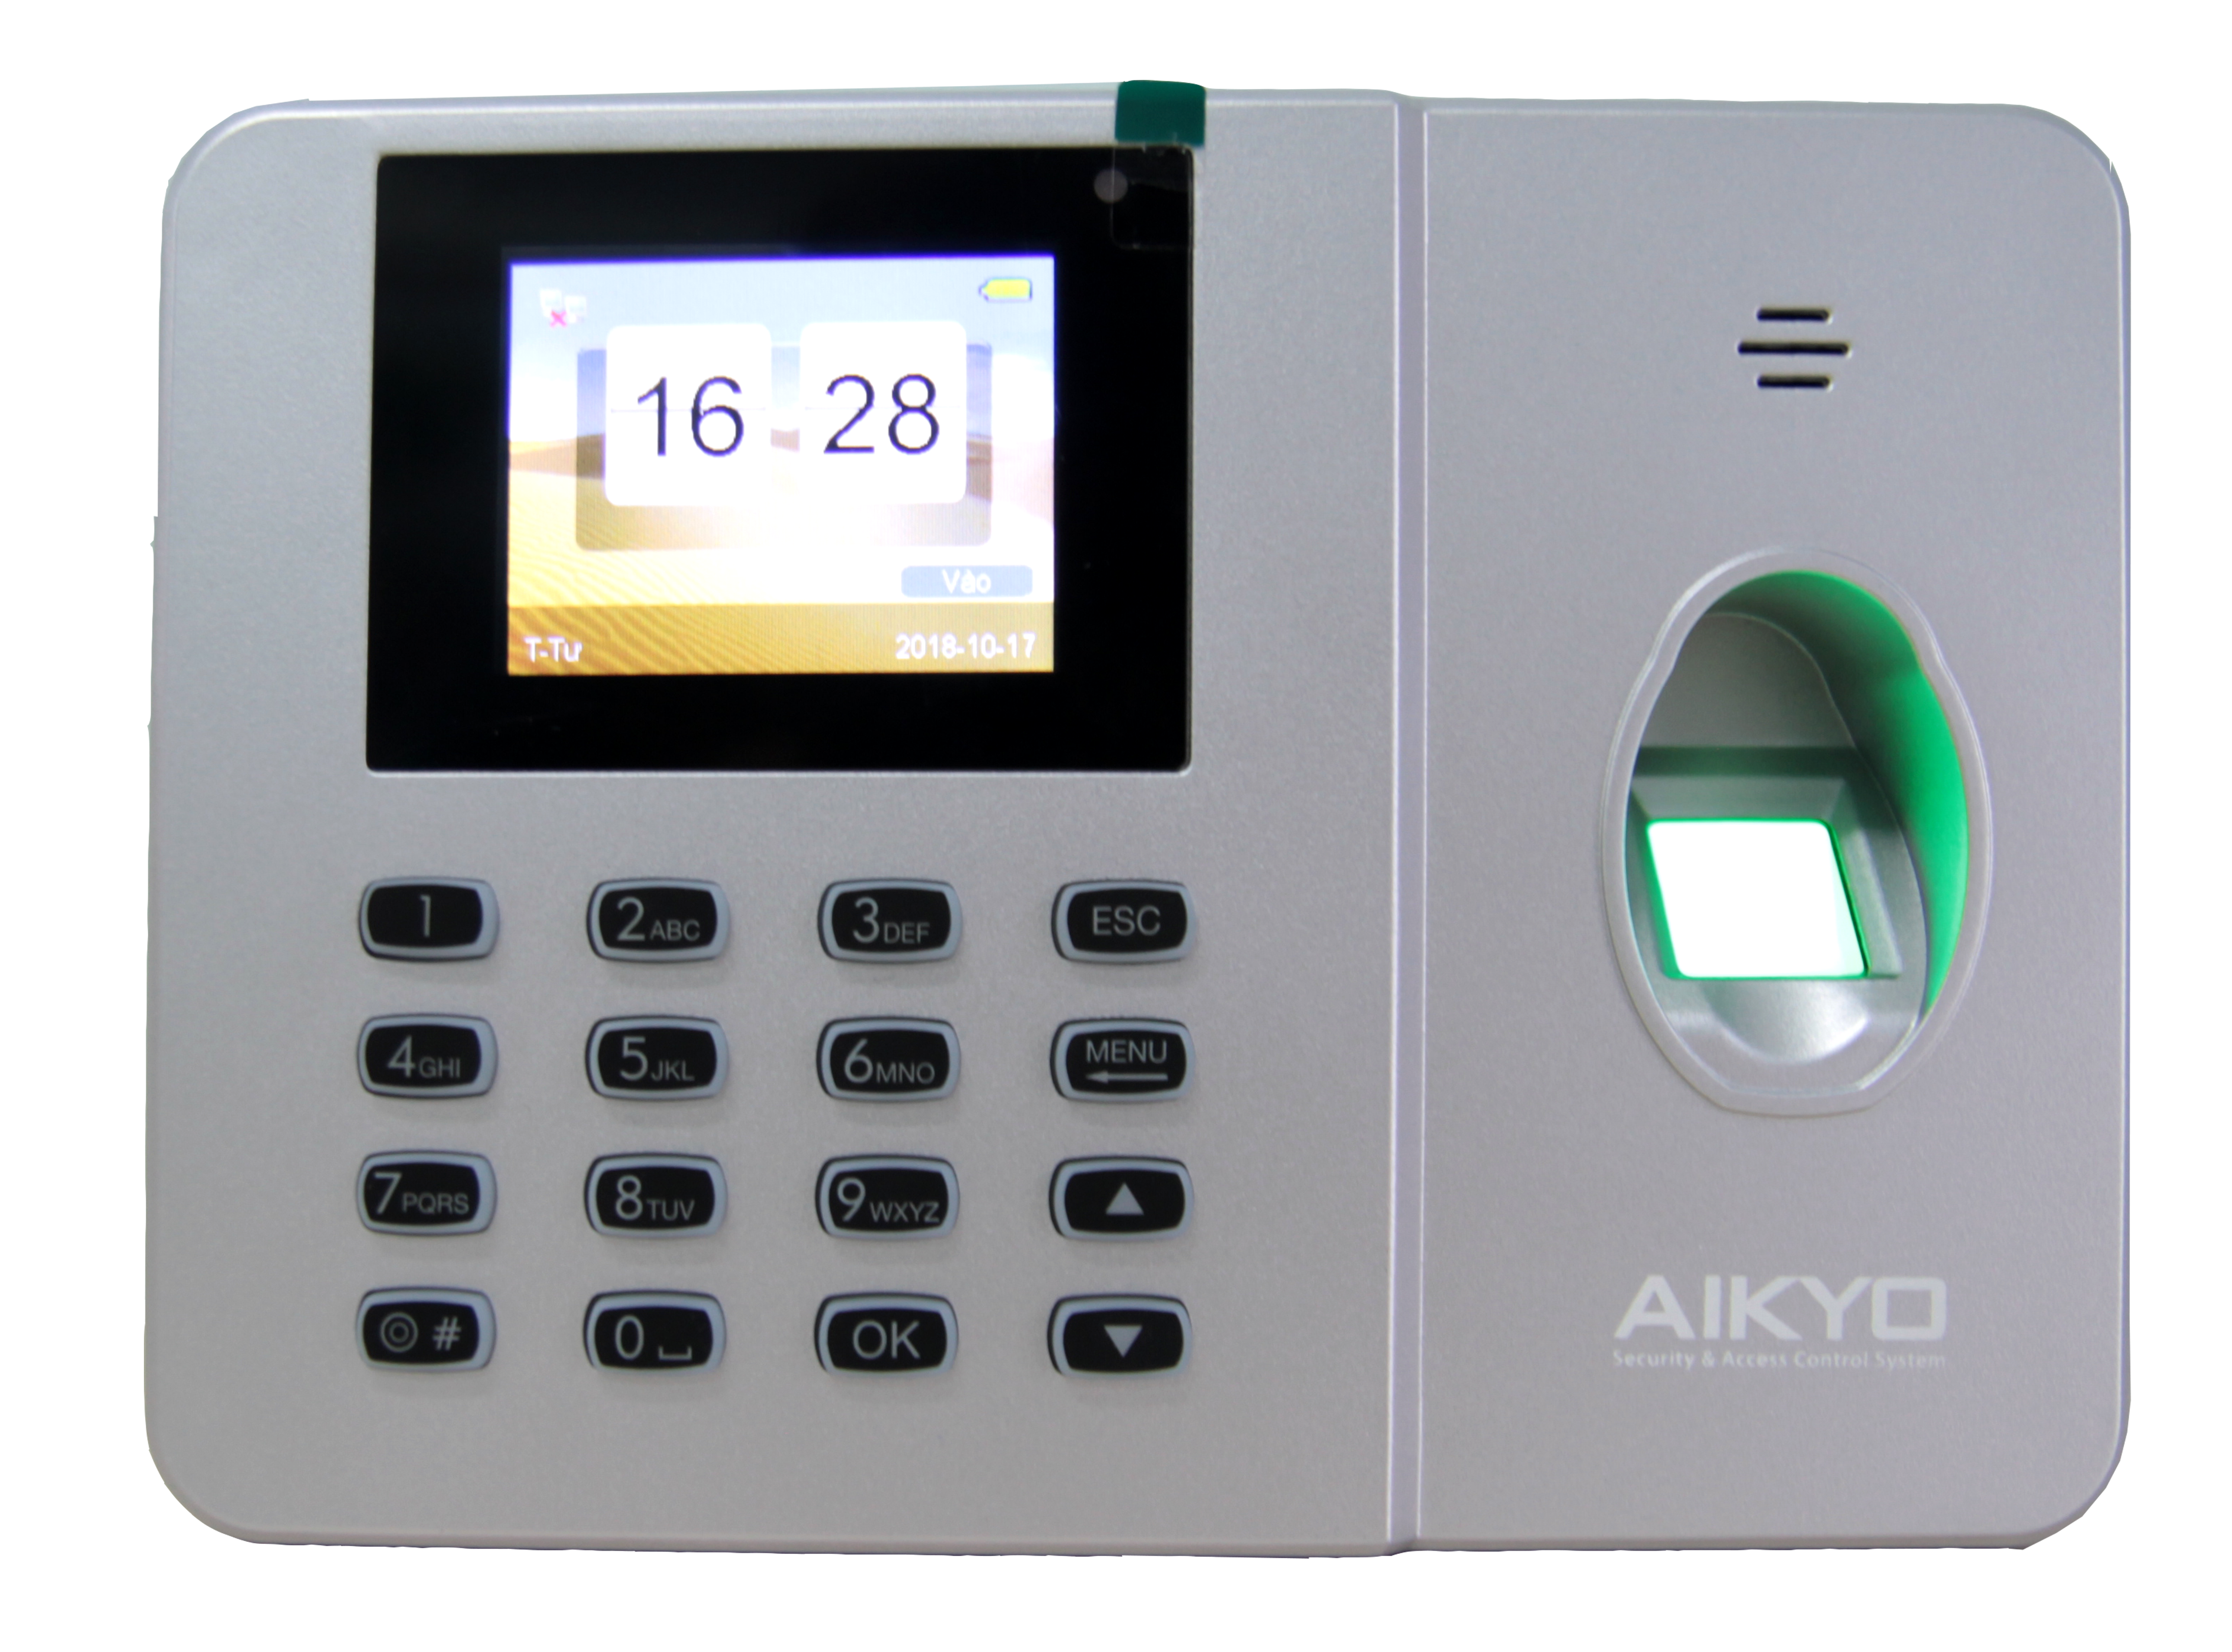 Aikyo A2200